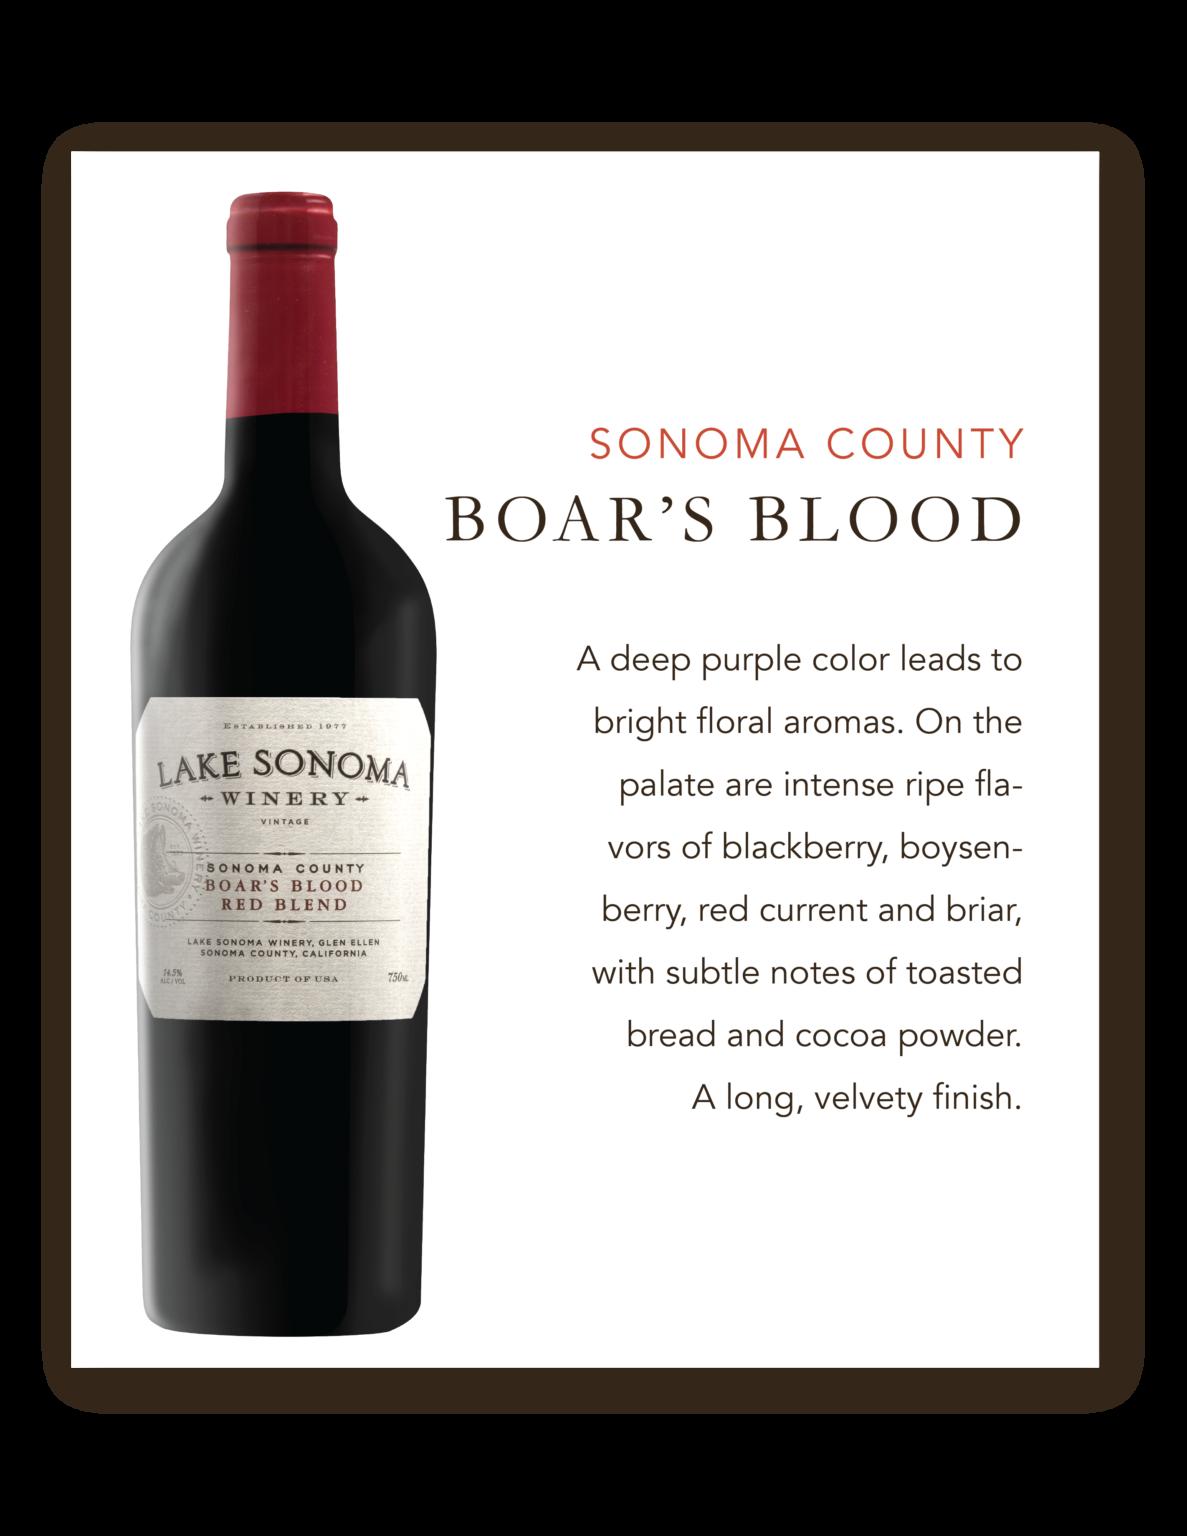 Lake Sonoma Boar's Blood Sonoma County